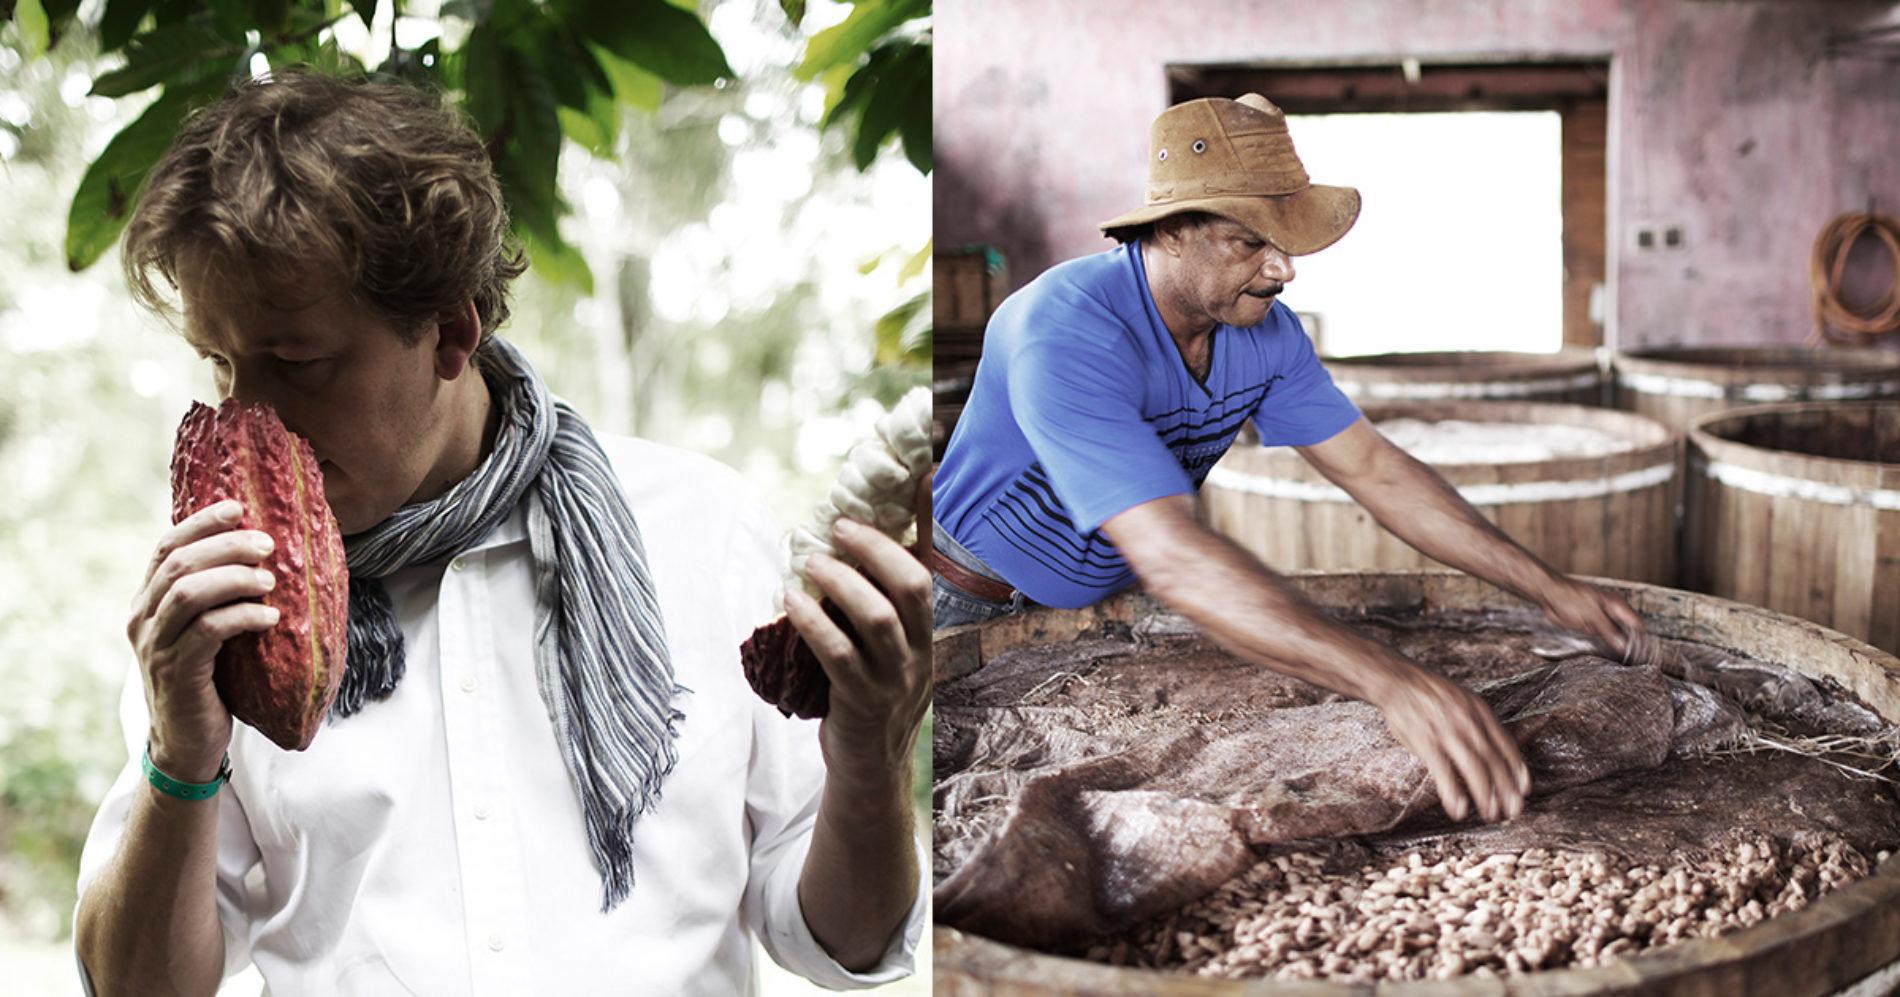 Pierre Marcolini: the chocolate innovator on his Dubai debut